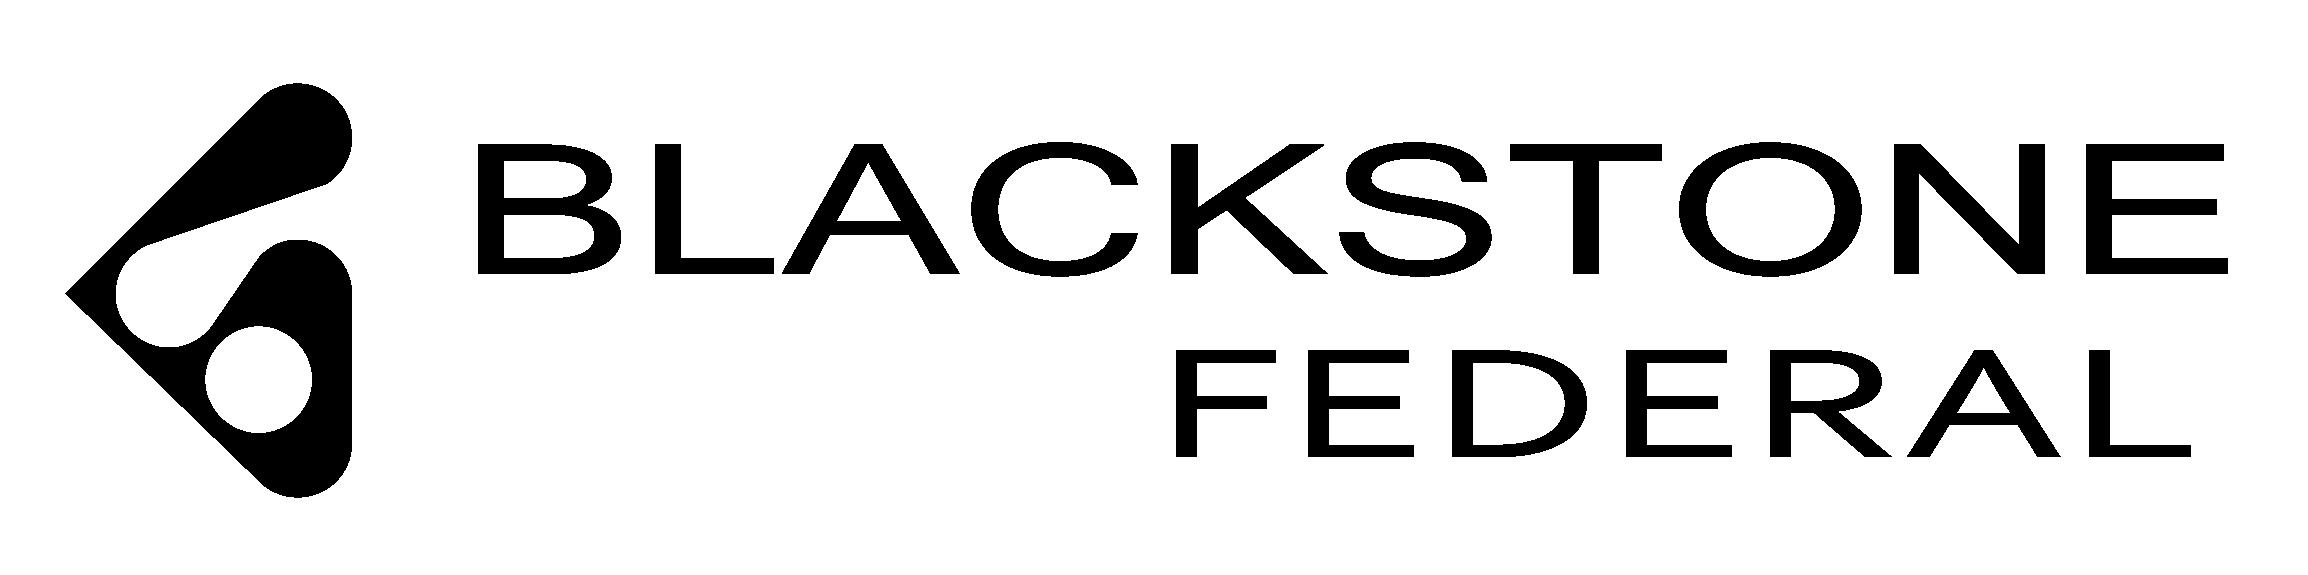 2017 BTGFED LOGO BLACK LRG